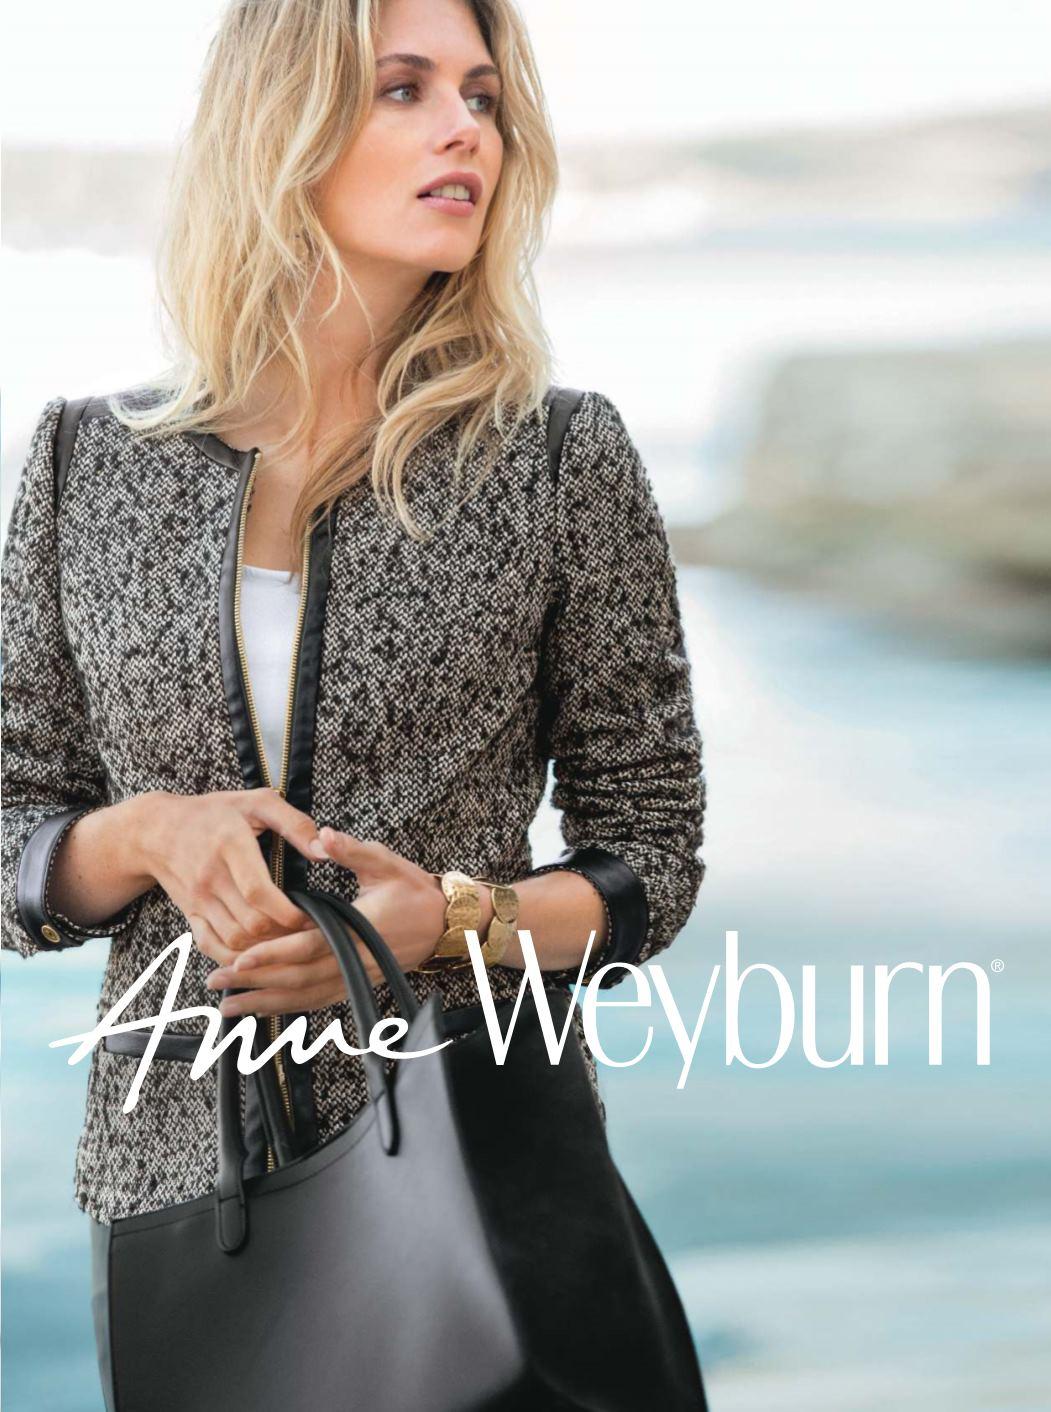 Anne weyburn catalogue automne hiver - La redoute catalogue automne hiver 2015 ...